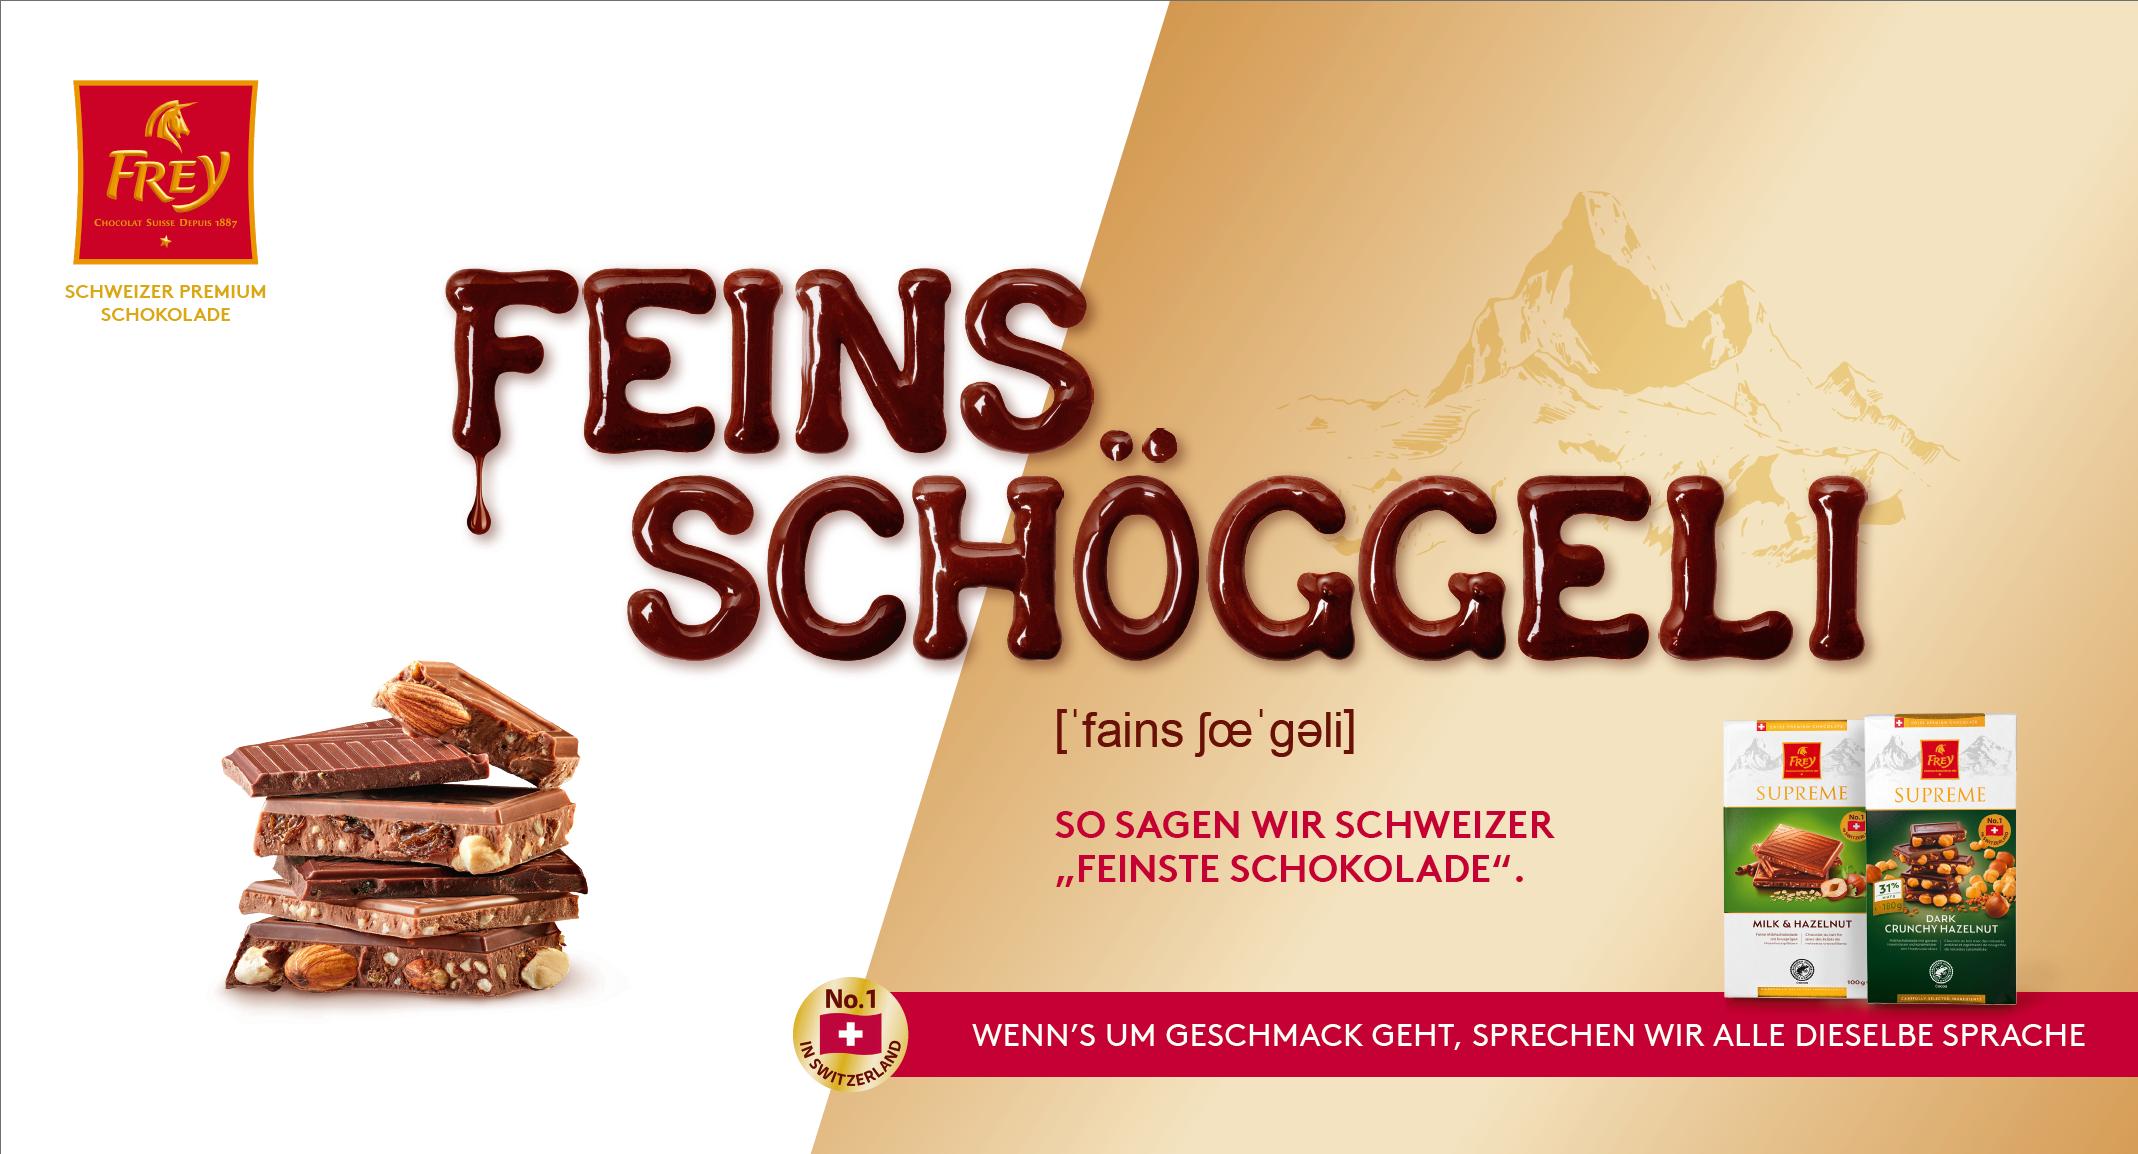 FREY KeyVisual - FEINS SCHÖGGELI Kampagne